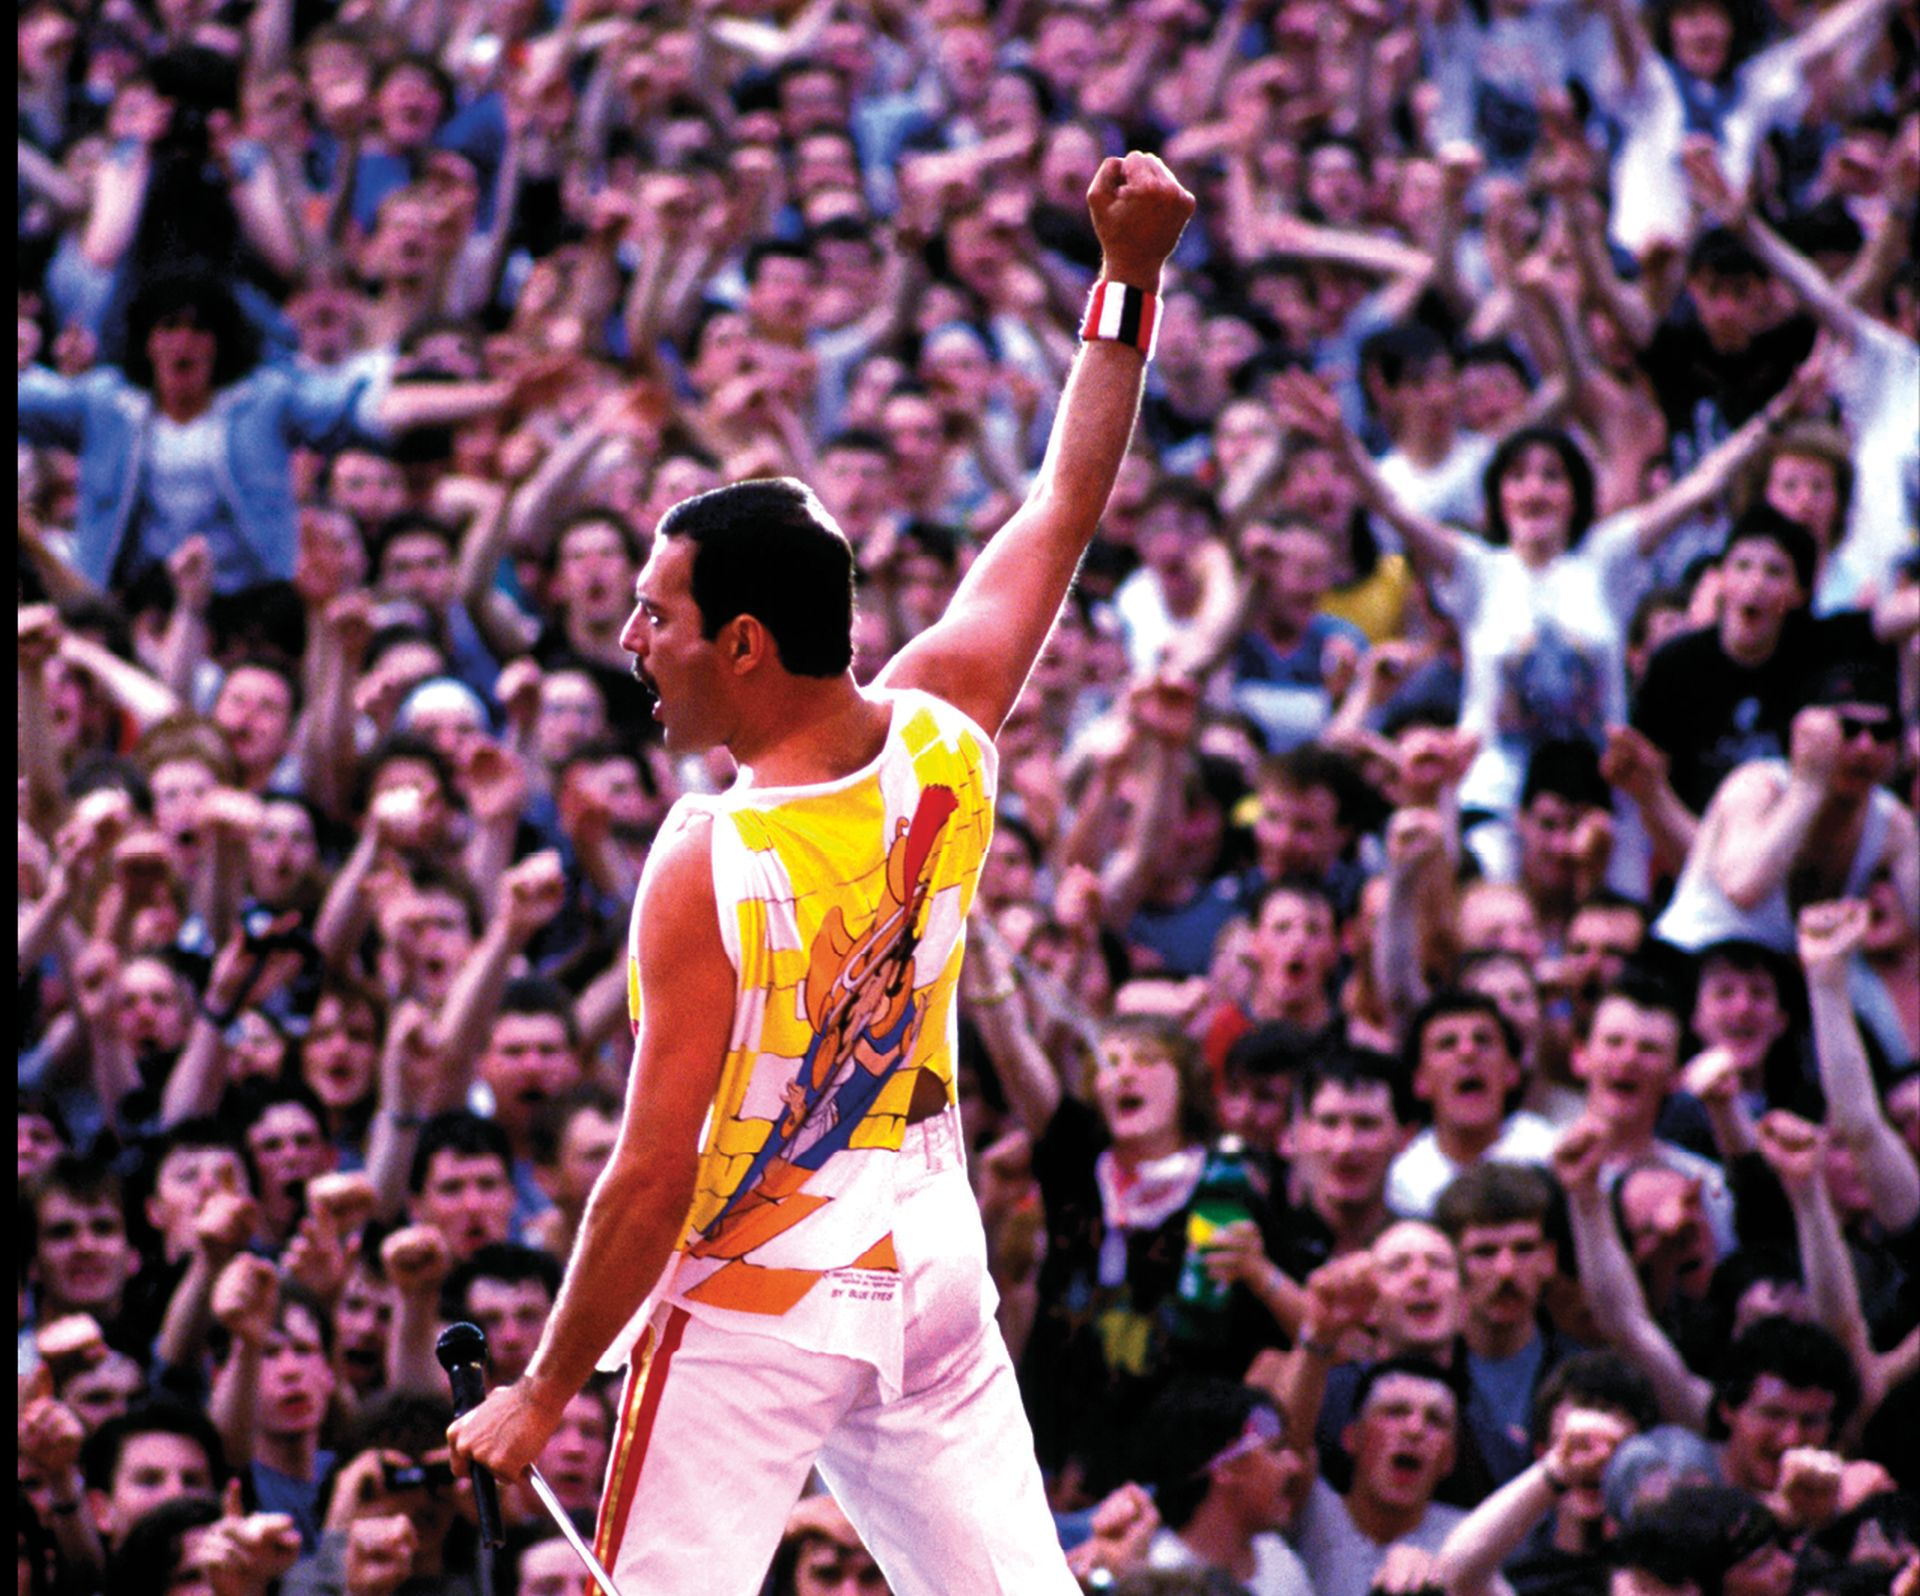 FELJTON Novi detalji o životu i preranoj smrti pjevača grupe Queen